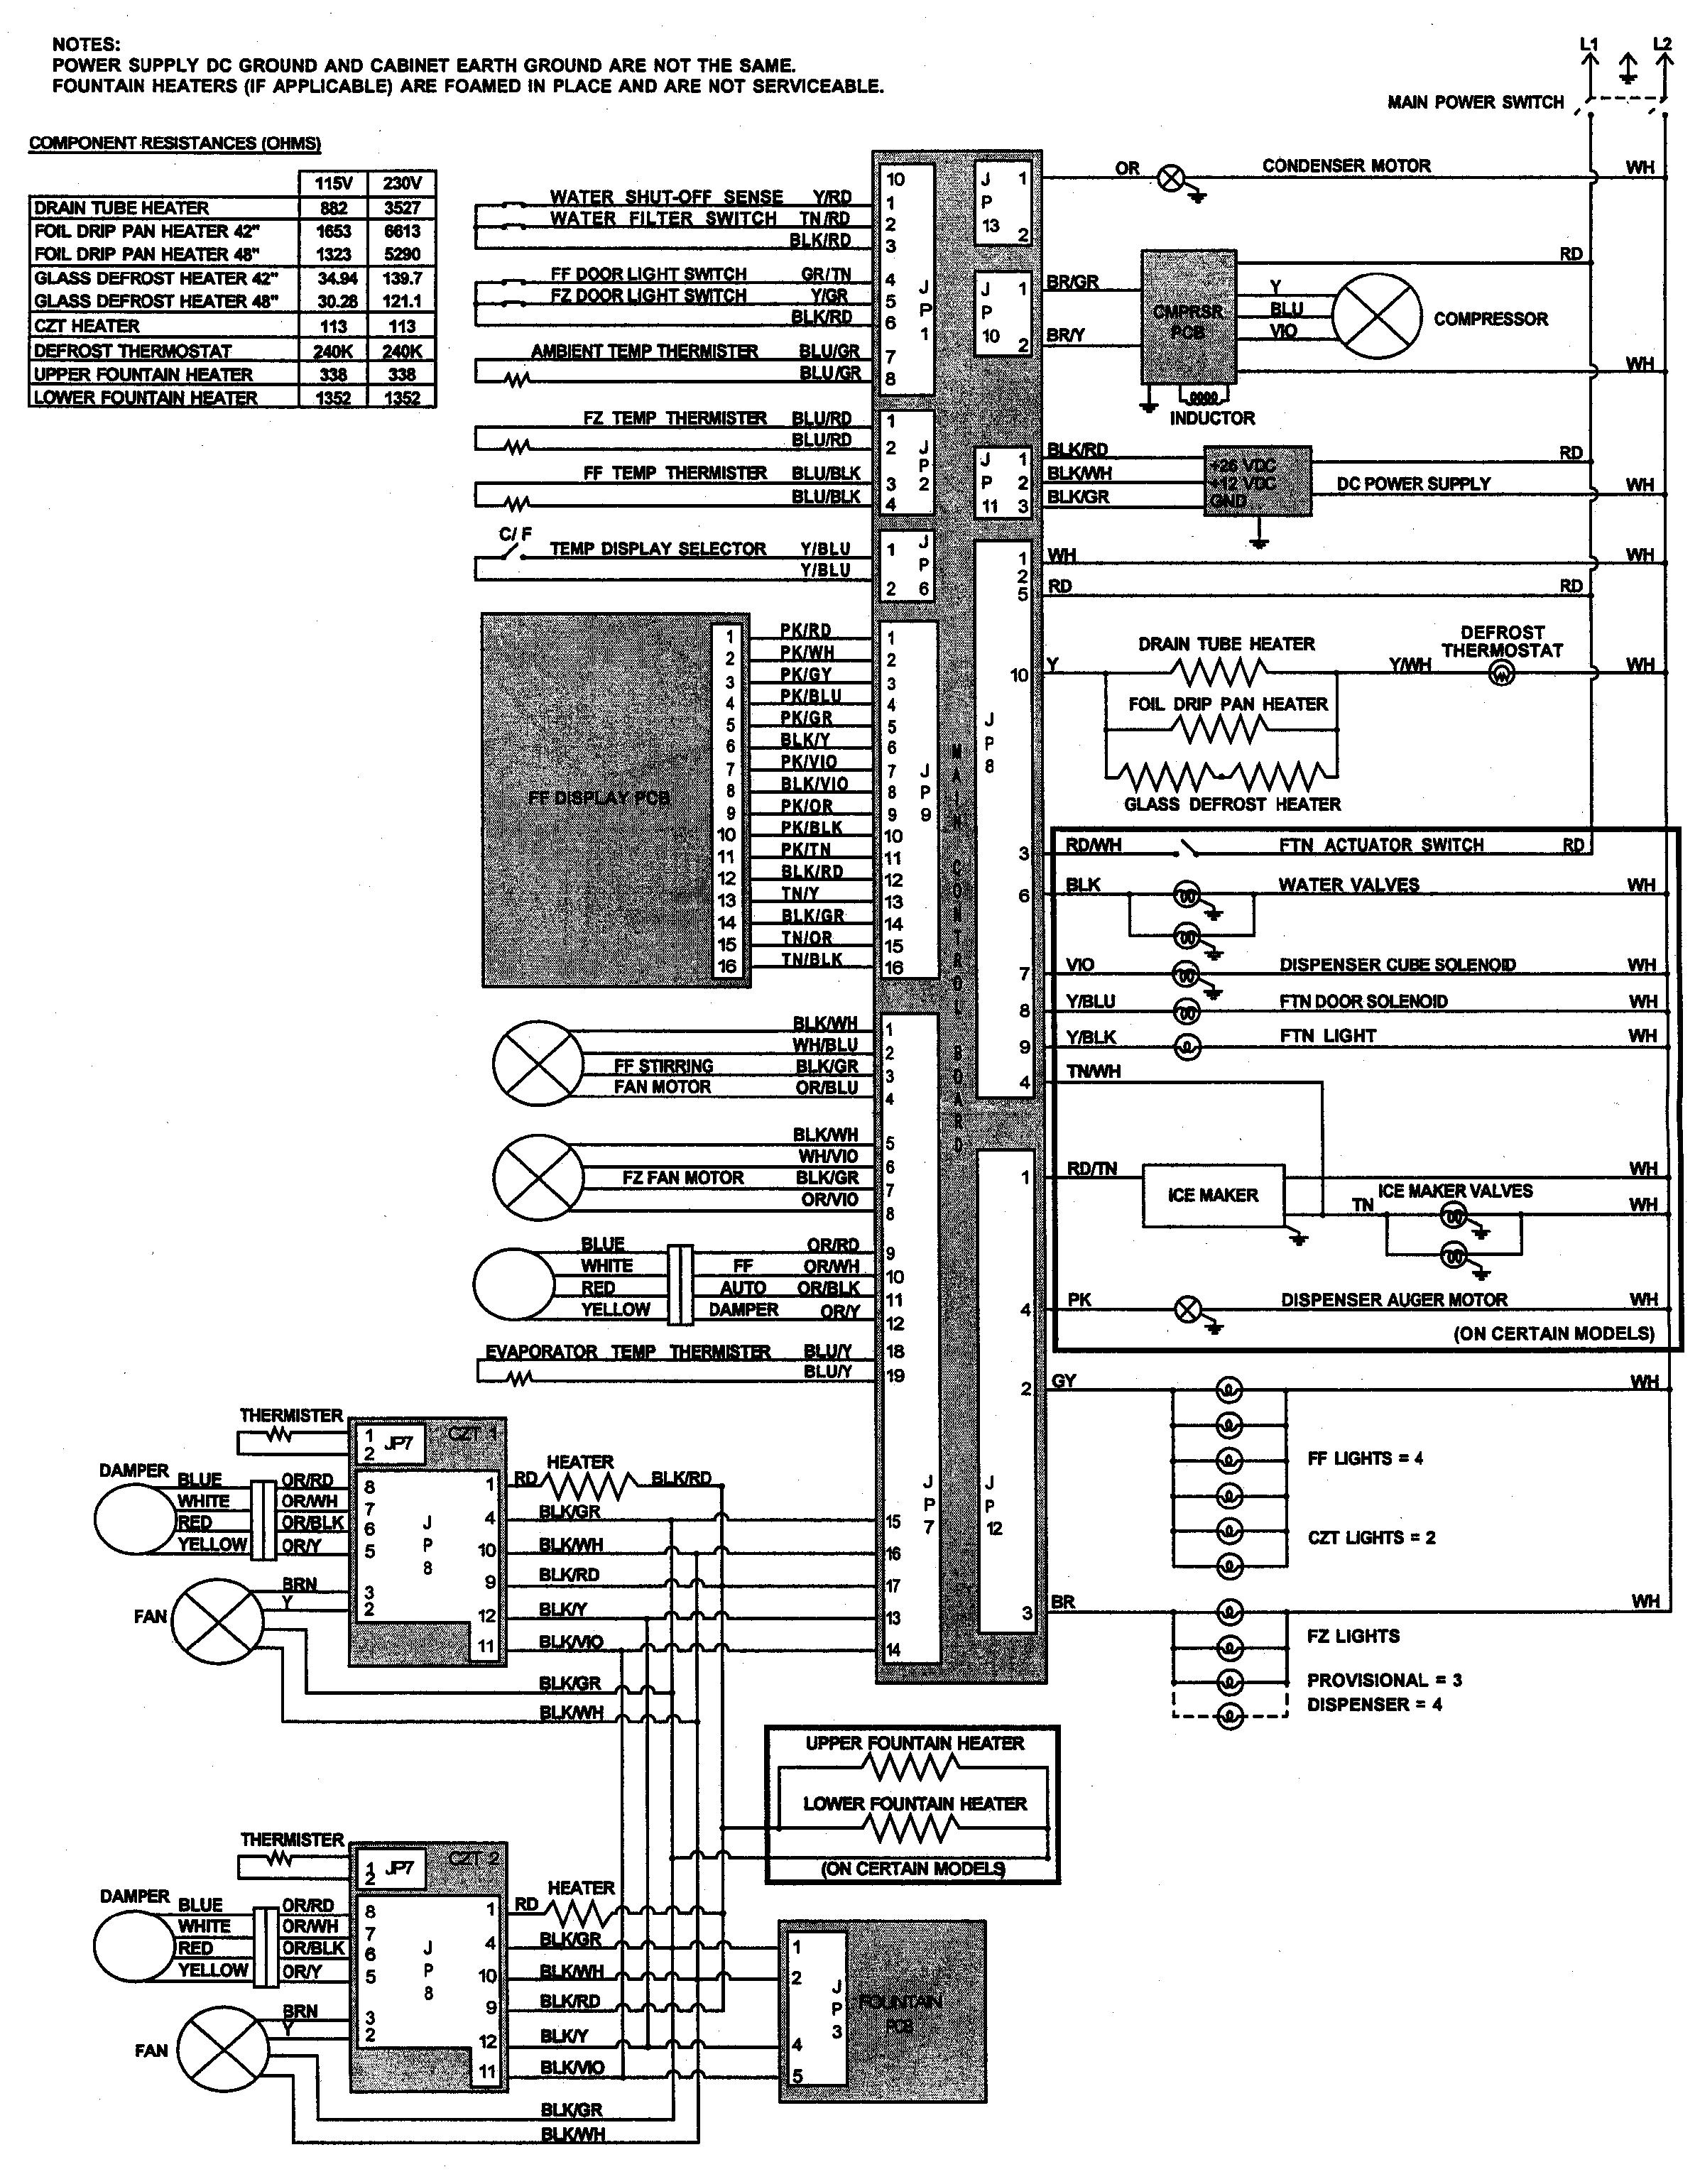 Jenn-Air  Jenn-Air Refrigeration  Wiring information